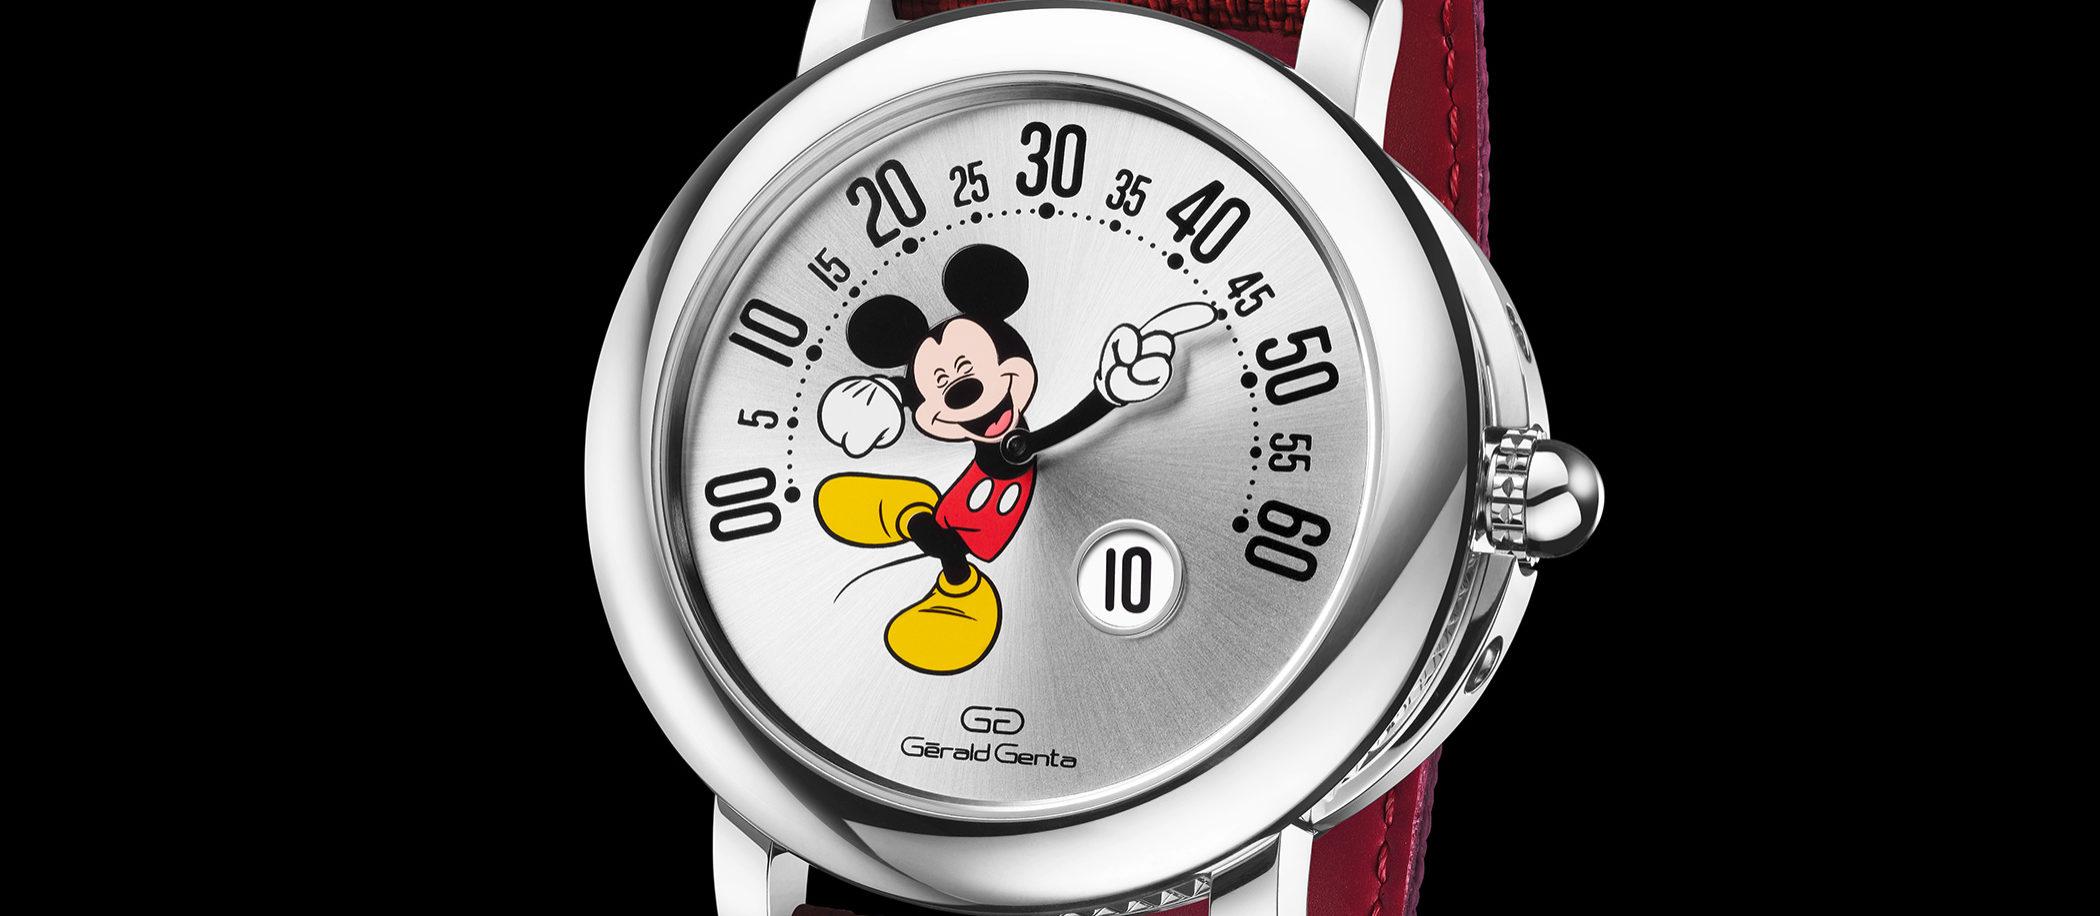 Gerald Genta Arena Retro Mickey Mouse Disney